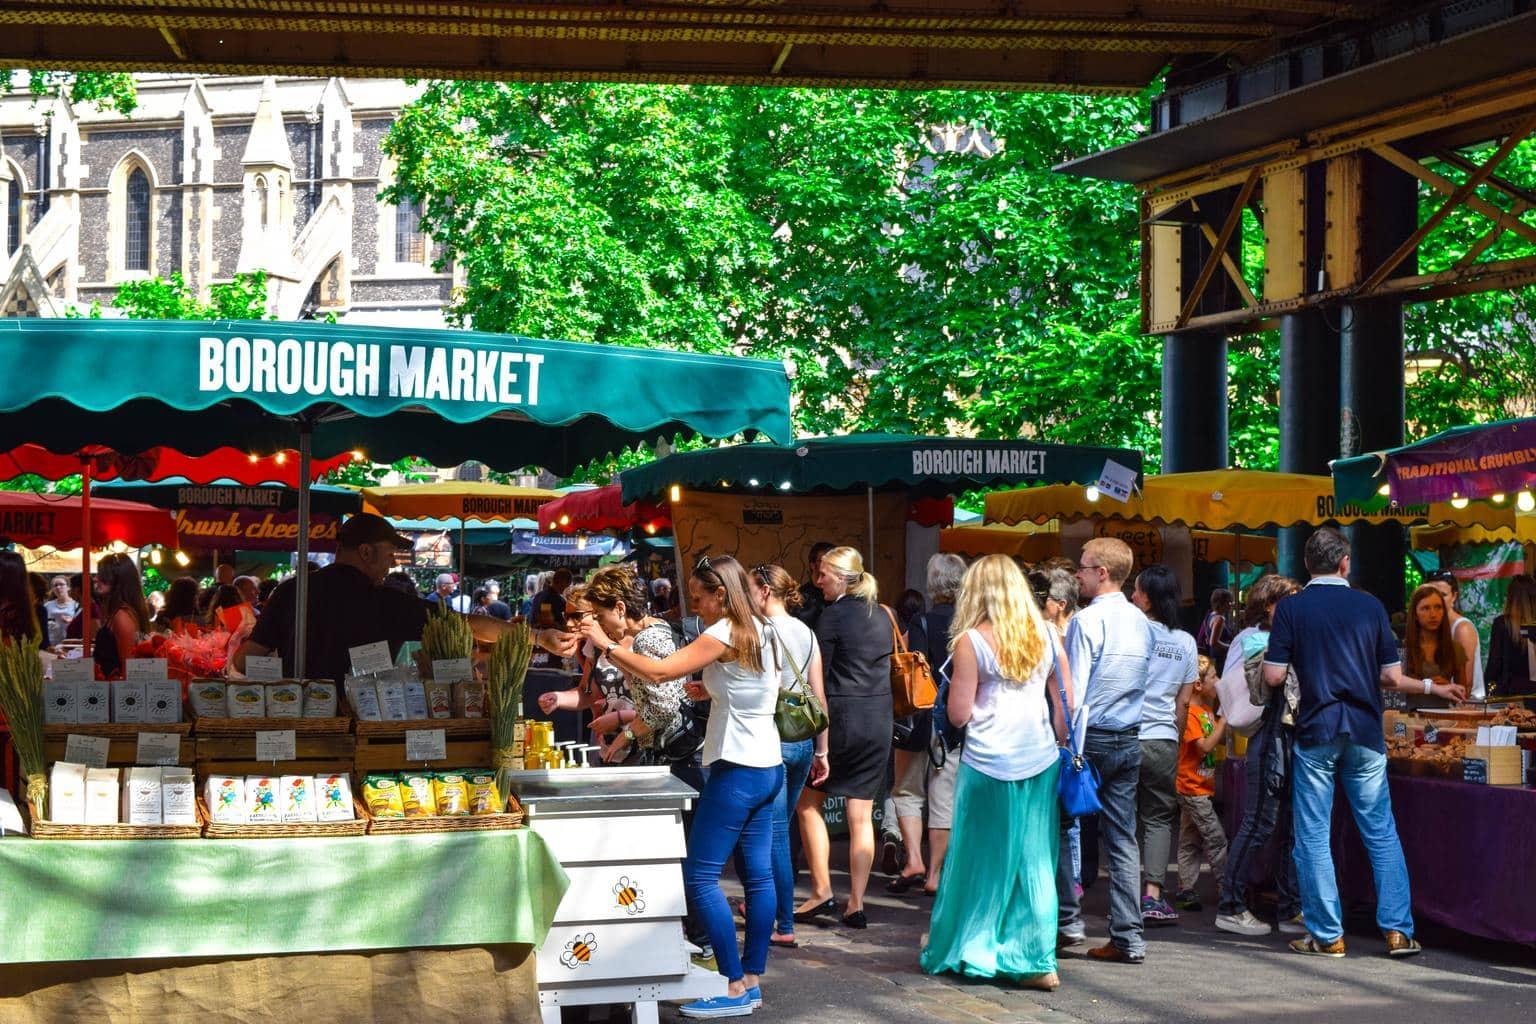 borough market, farmers market